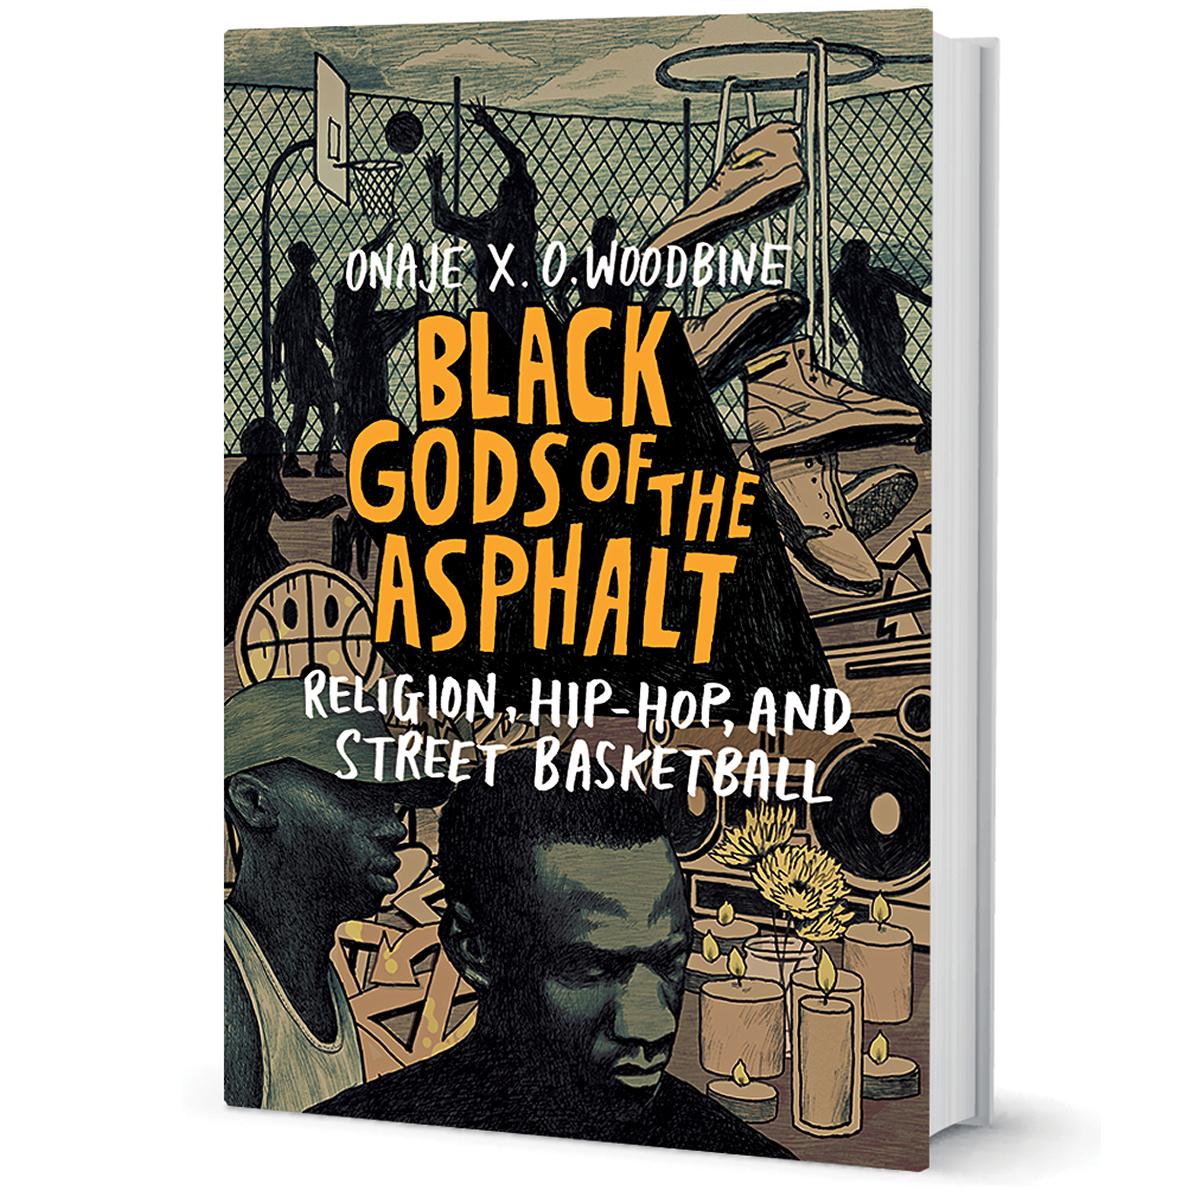 Onaje X.O. Woodbine Black Gods of the Asphalt